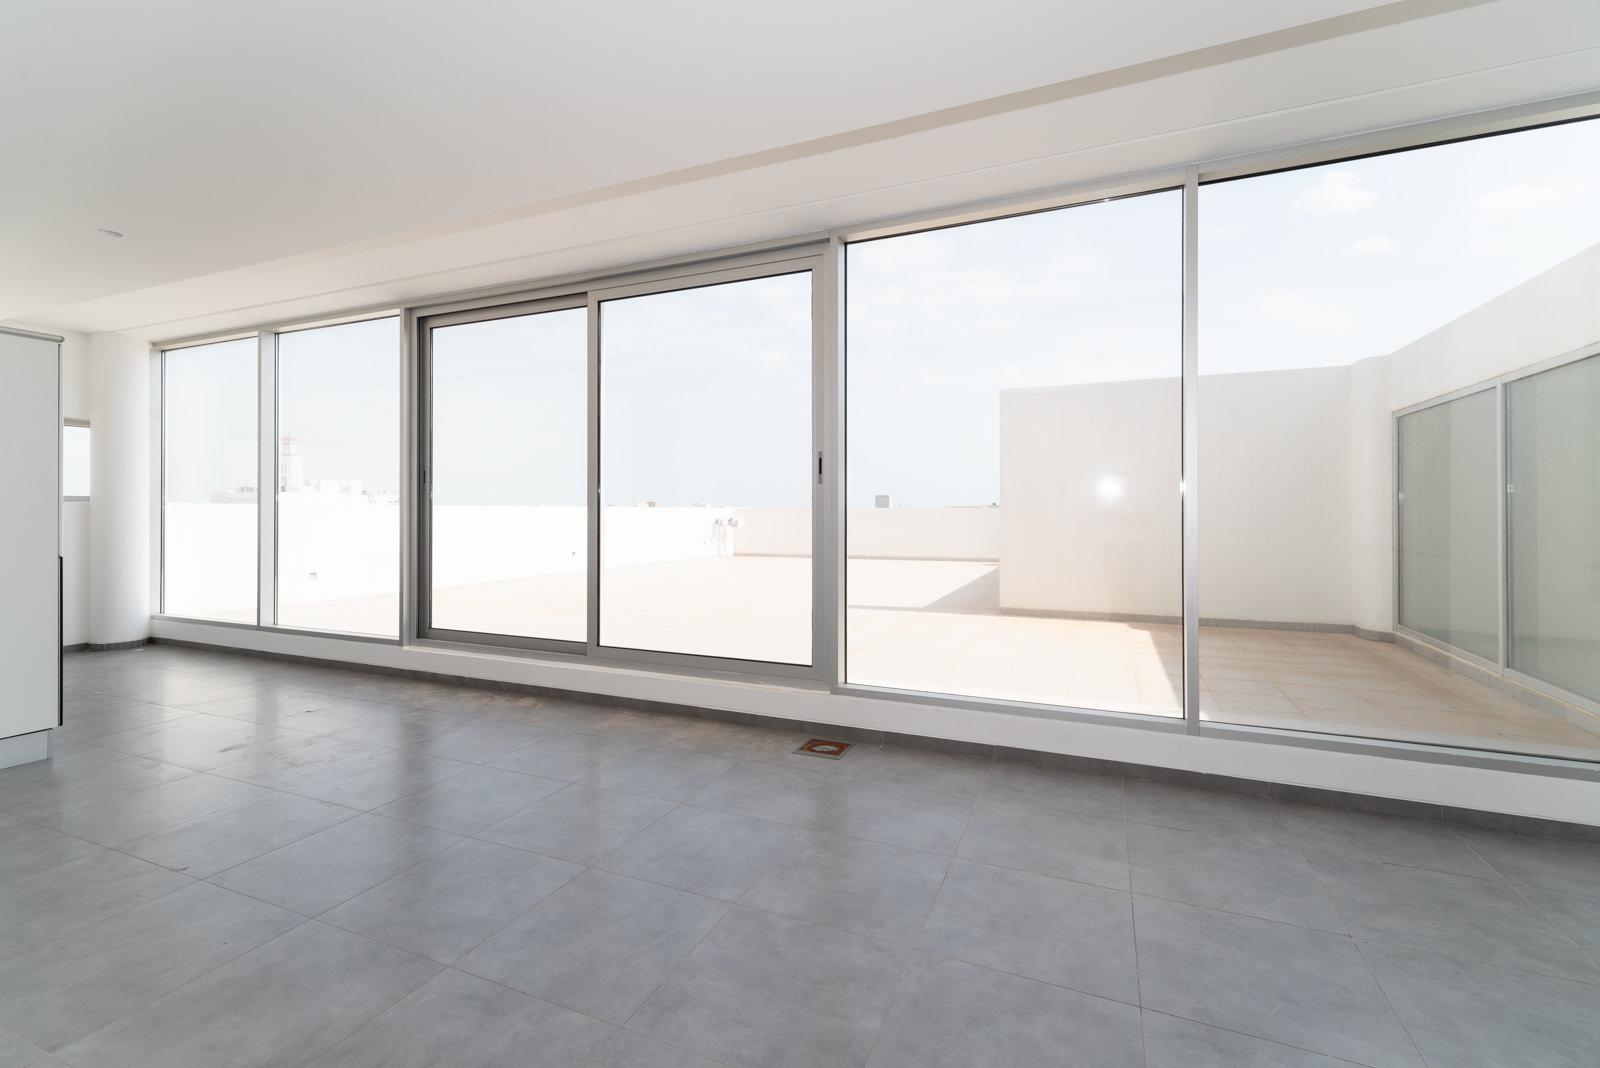 Fnaitees – fantastic, unfurnished, four bedroom duplex w/terraces